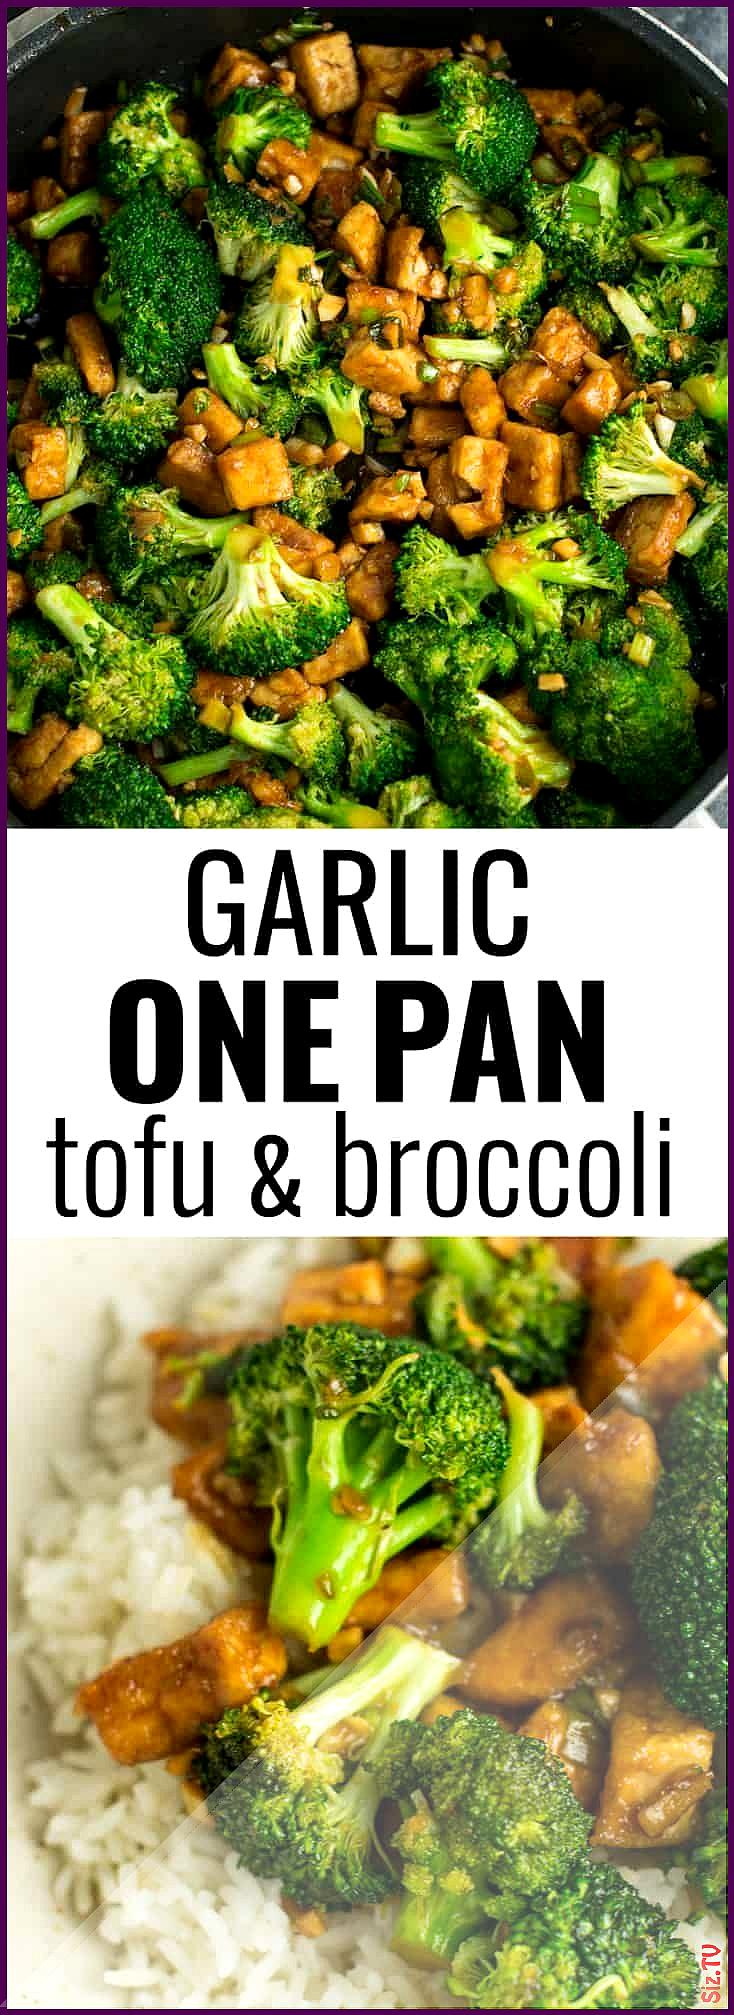 Garlic tofu broccoli skillet recipe made in just one pan A healthy alternative Garlic tofu broccoli skillet recipe made in just one pan A healthy alternative Tara waterme...